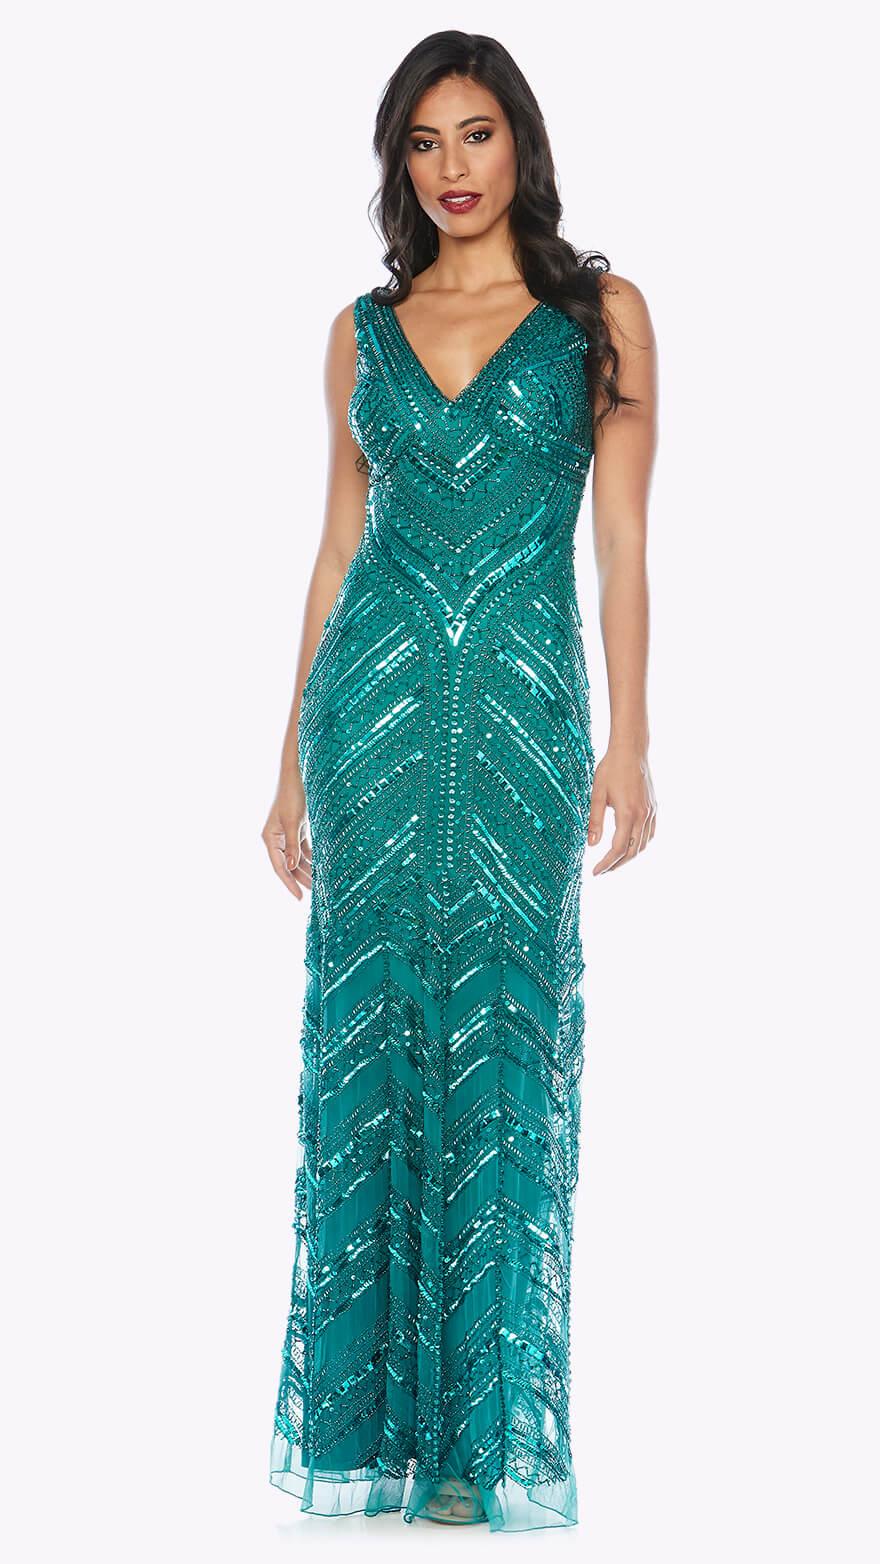 Z0001 Floor-length beaded gown with V neckline and fishtail skirt